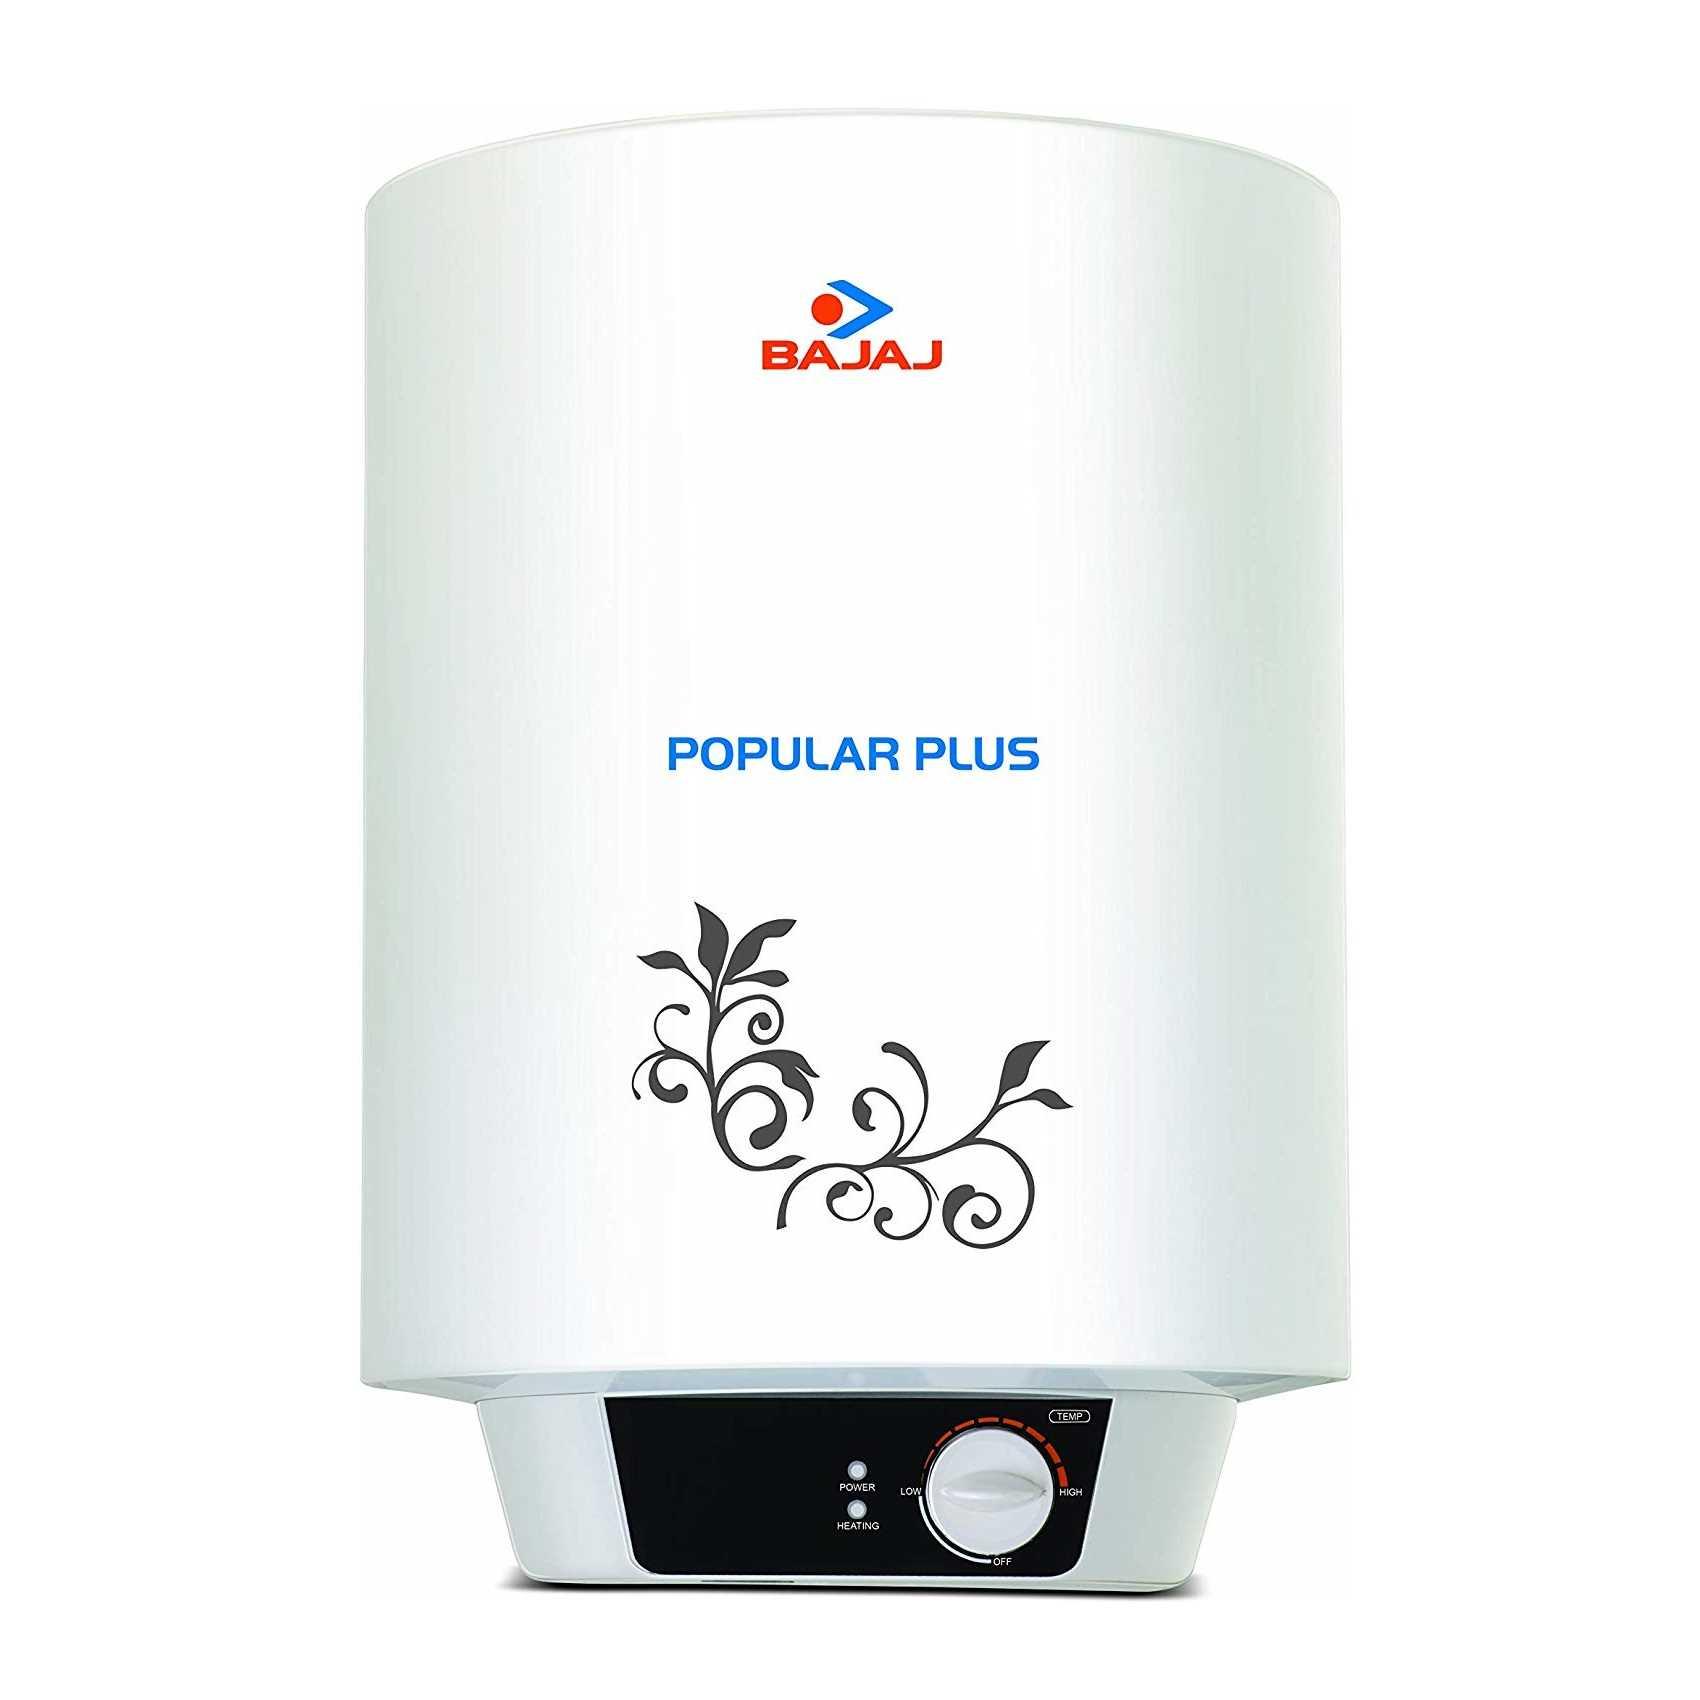 Bajaj Popular Plus 25 Litre Storage Water Heater